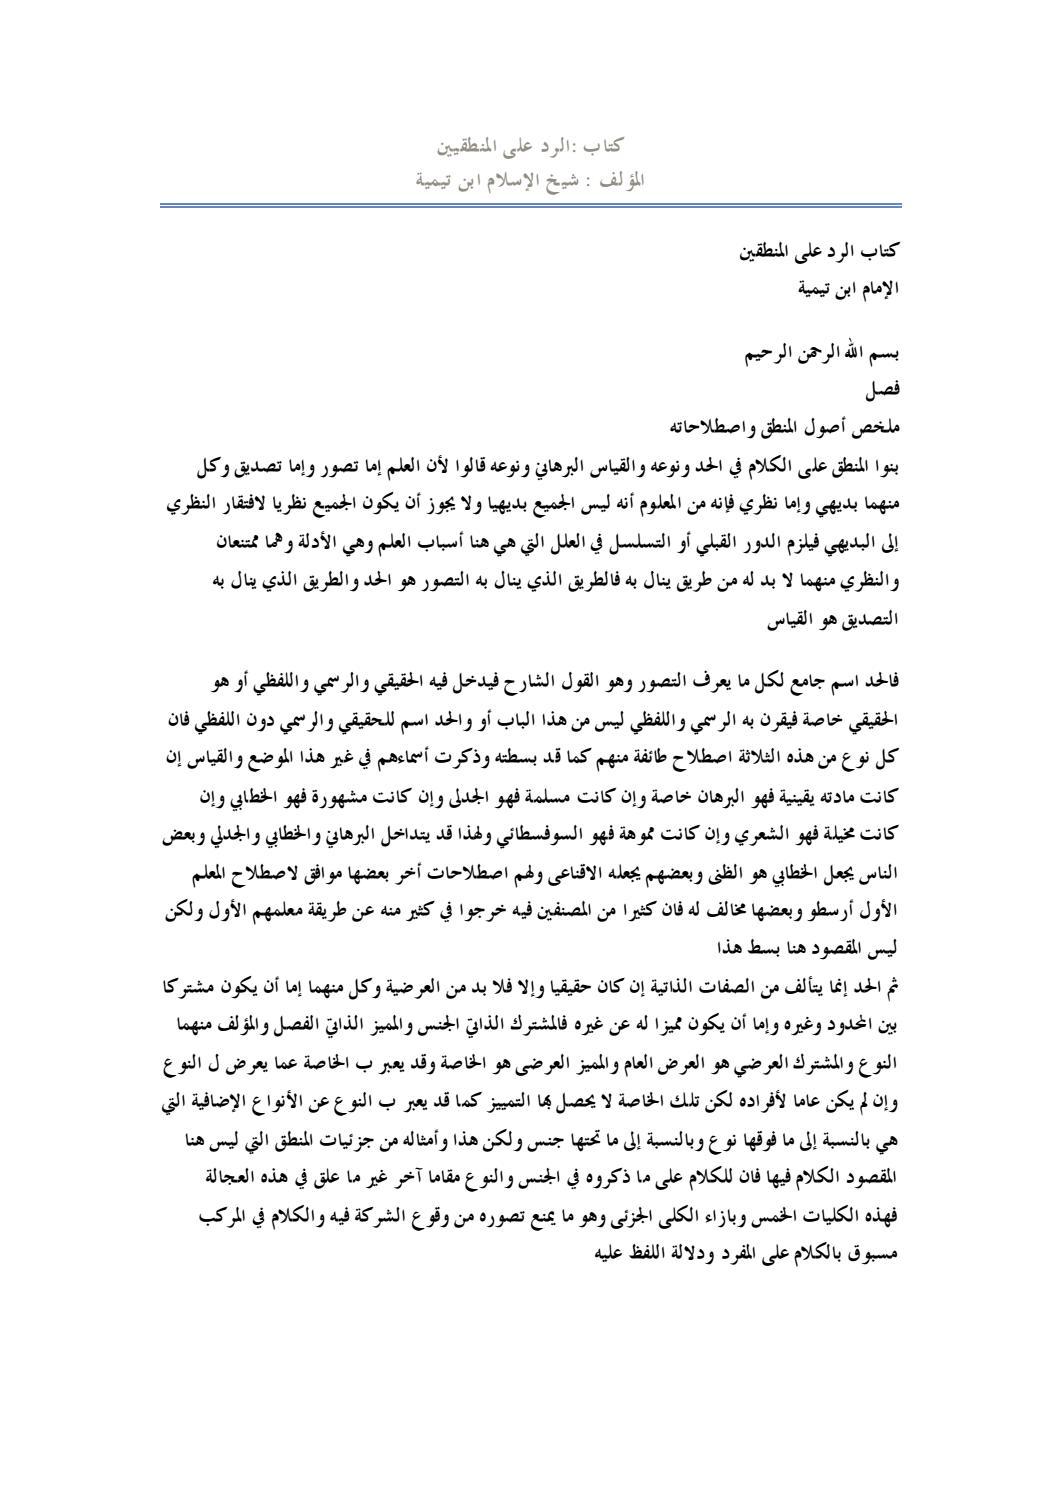 89702a1476be8 الرد على المنطقيين by Islamic Library - issuu